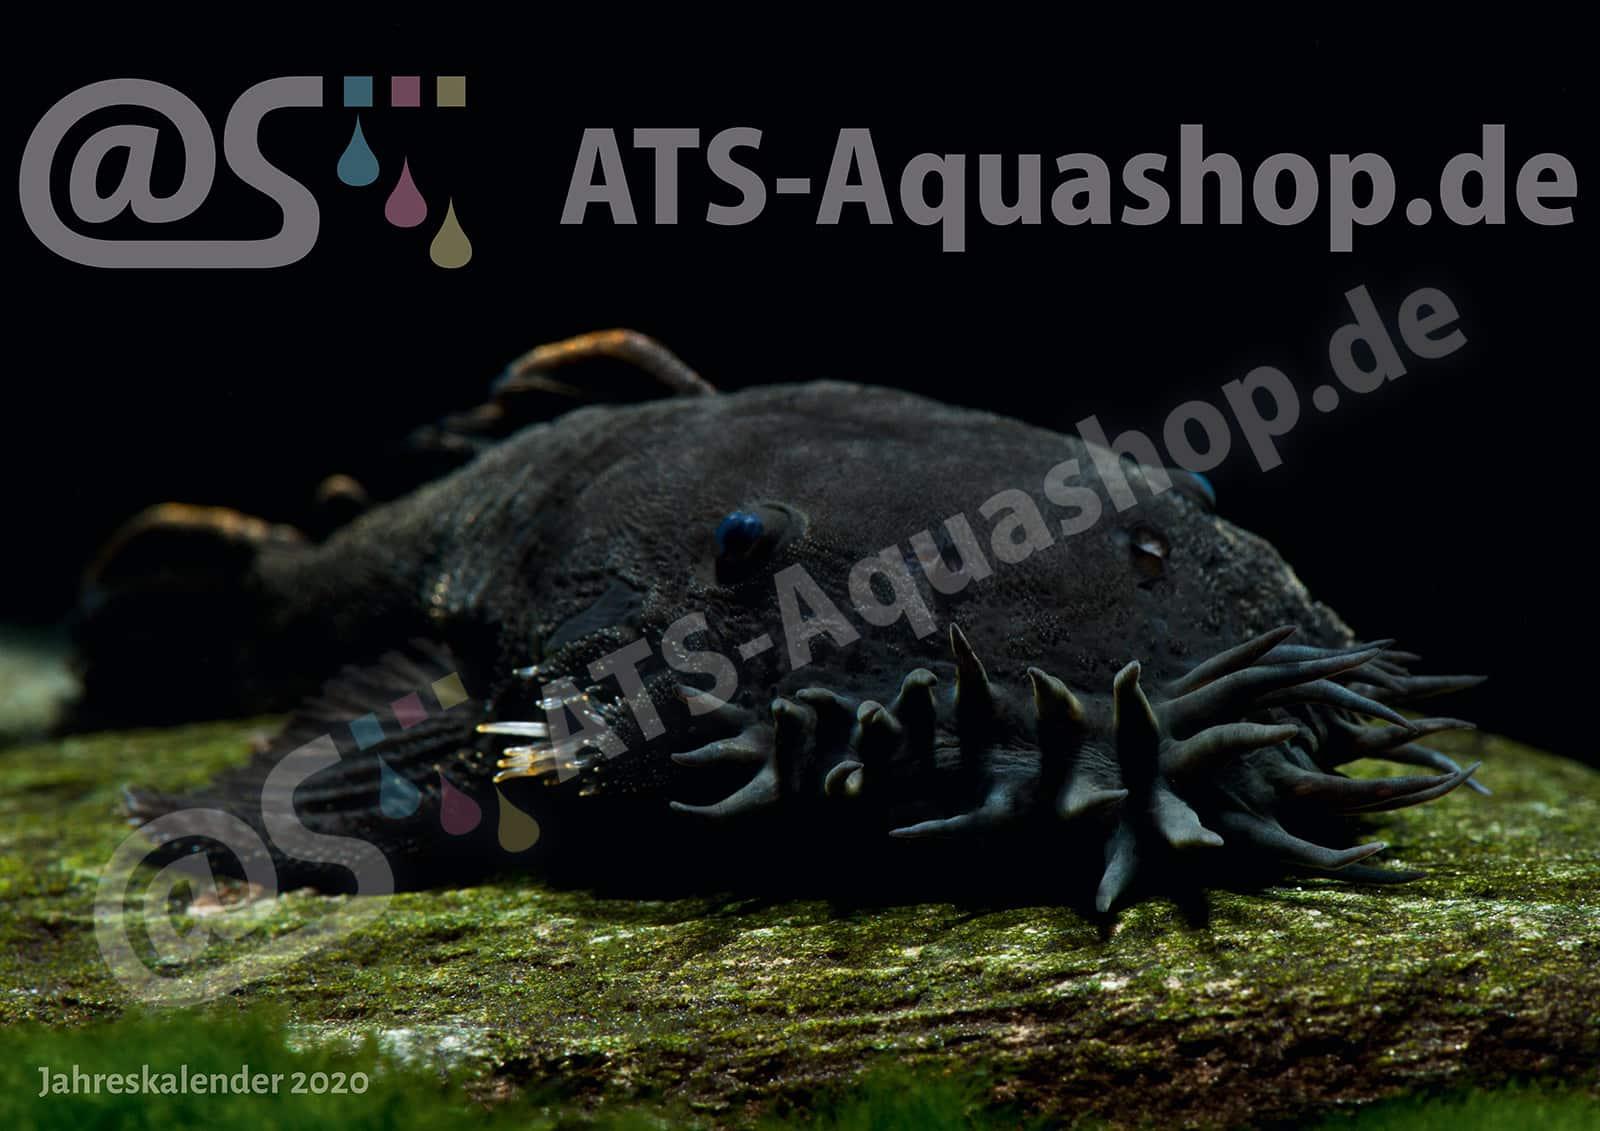 Foto Jahreskalender 2020 DIN A3: Ancistrus ranunculus (L 34)